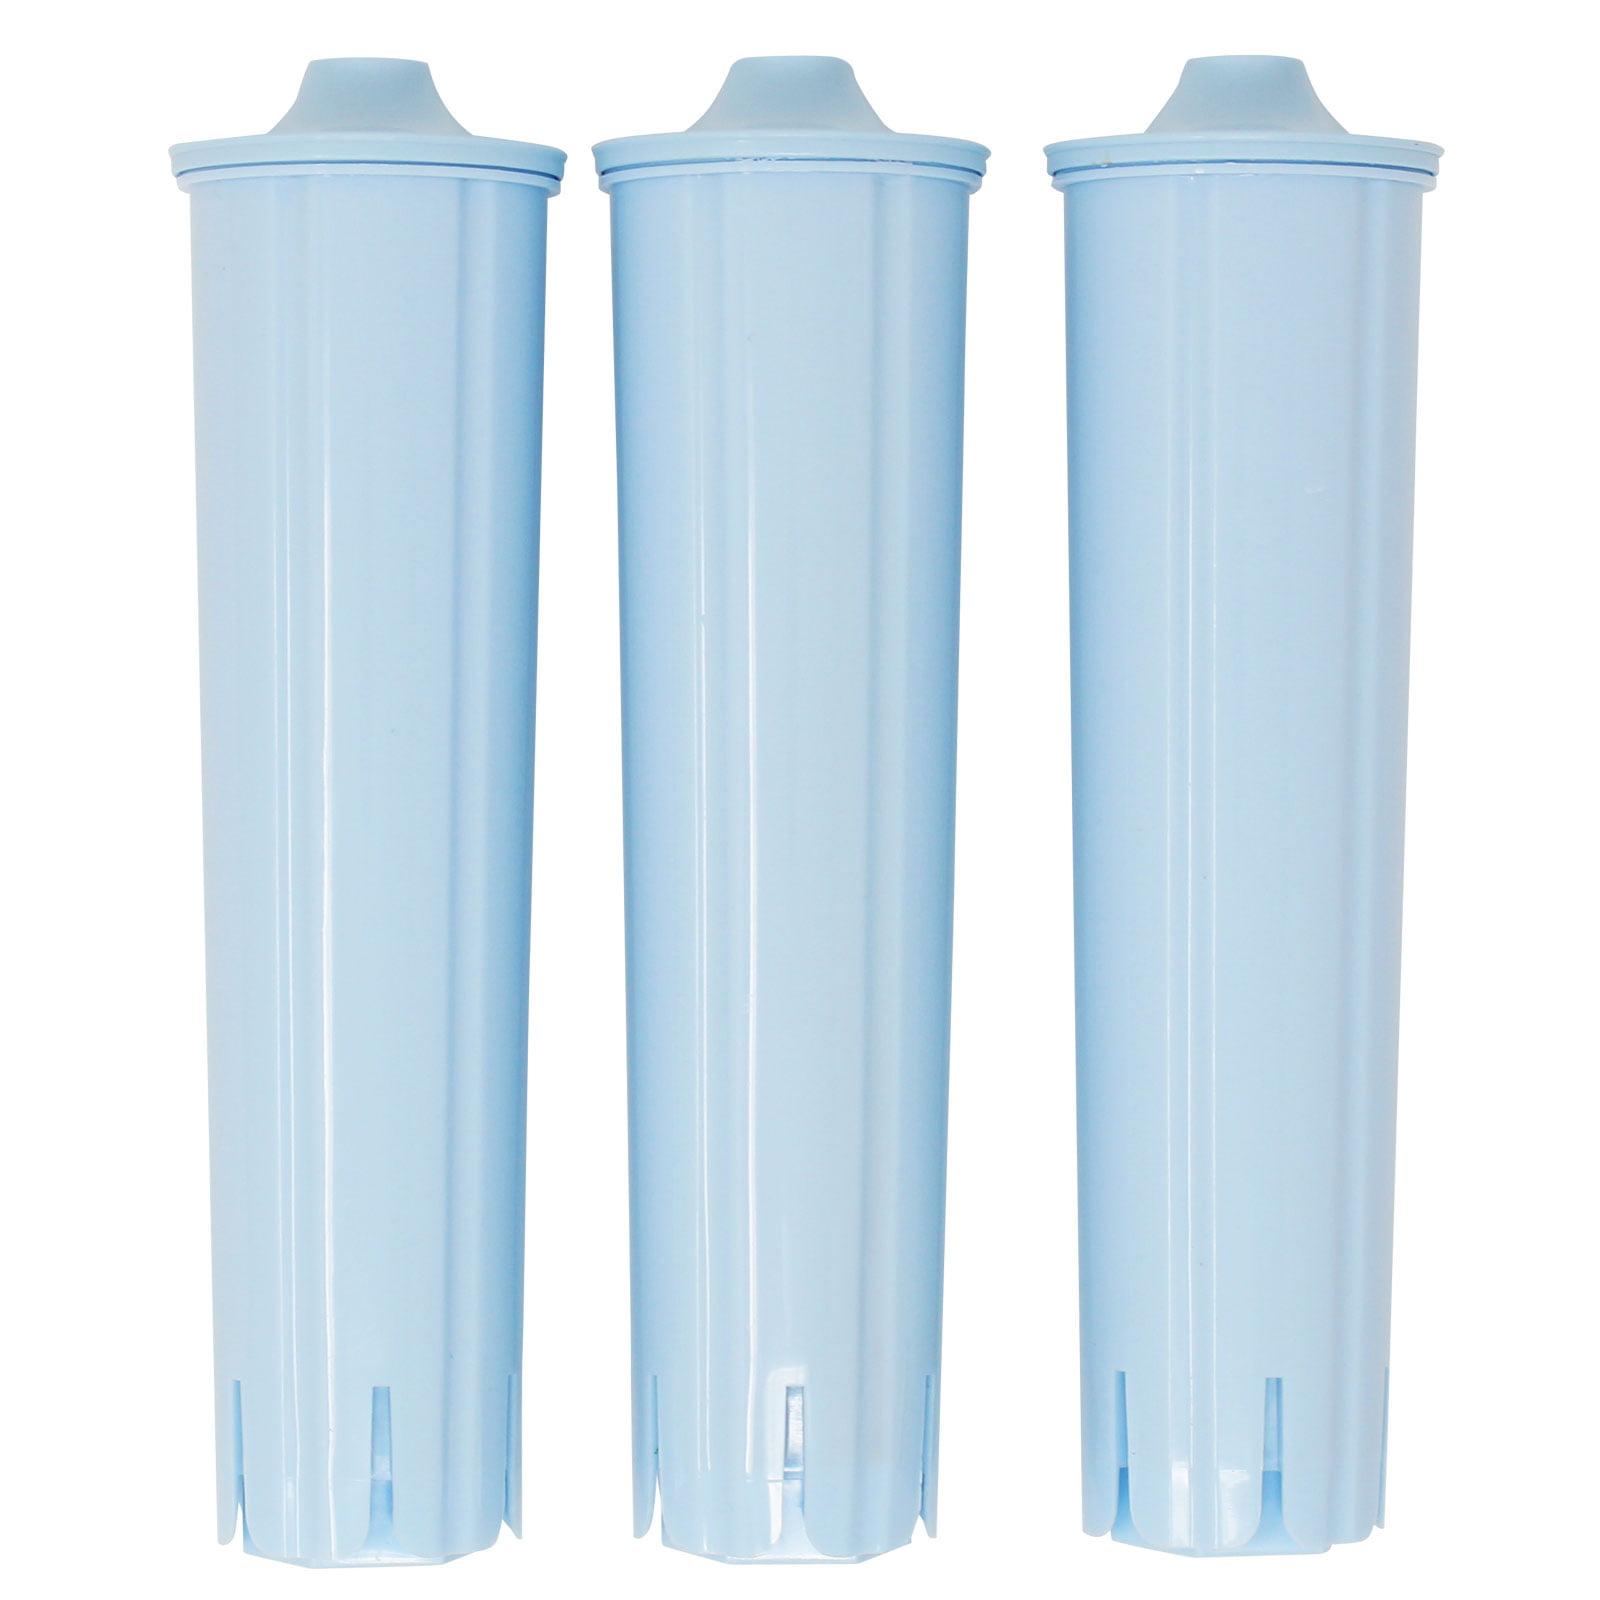 3 Compatible Water Filter Cartridge for Jura-Capresso IMPRESSA C9 Fully Automatic Coffee Center - Compatible Jura Clearyl Blue Water Filter